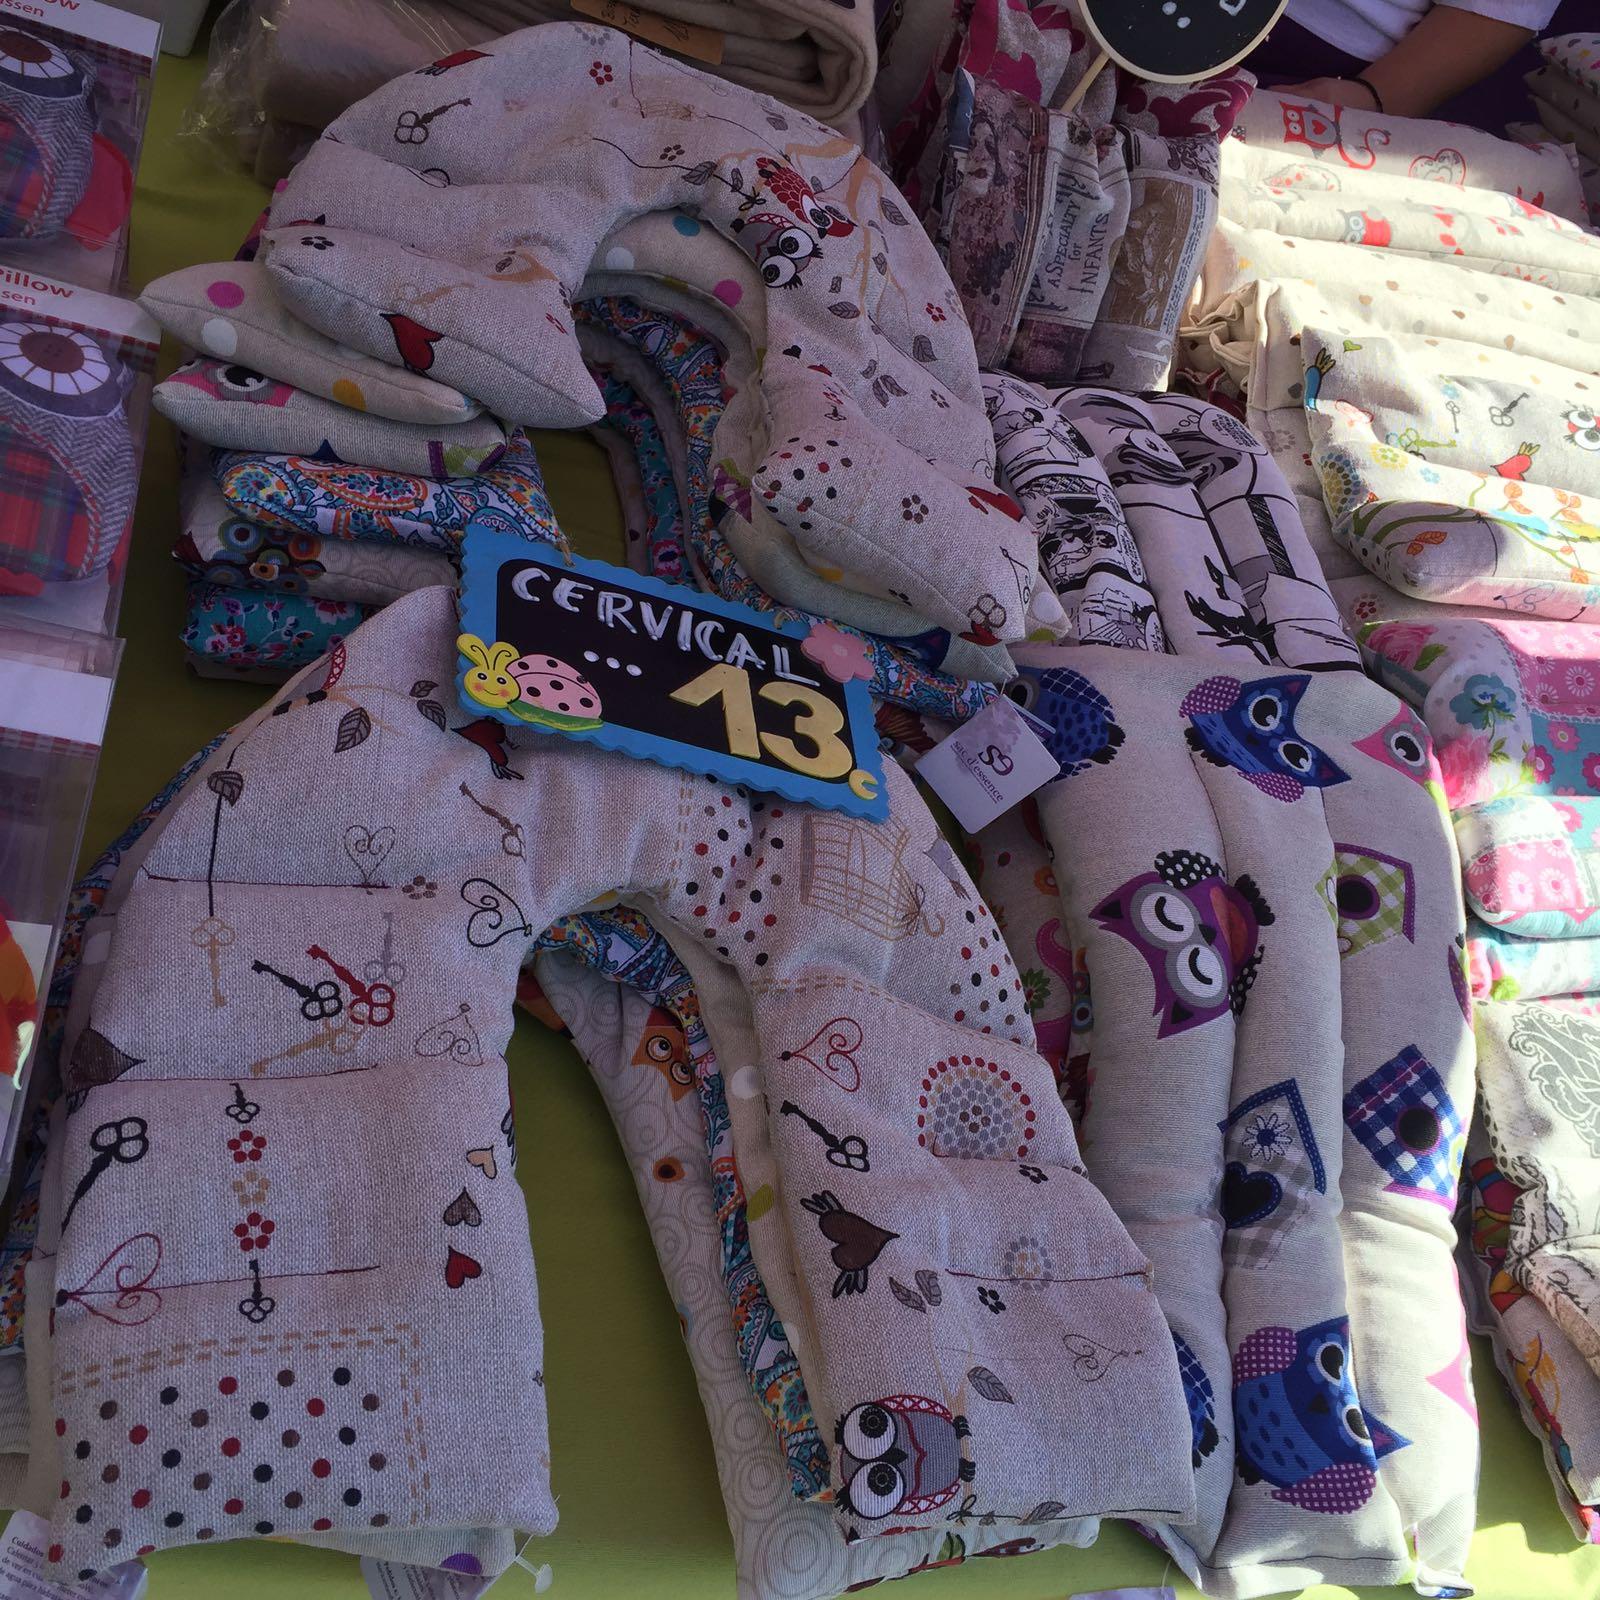 mercado-cervantino-sole-26